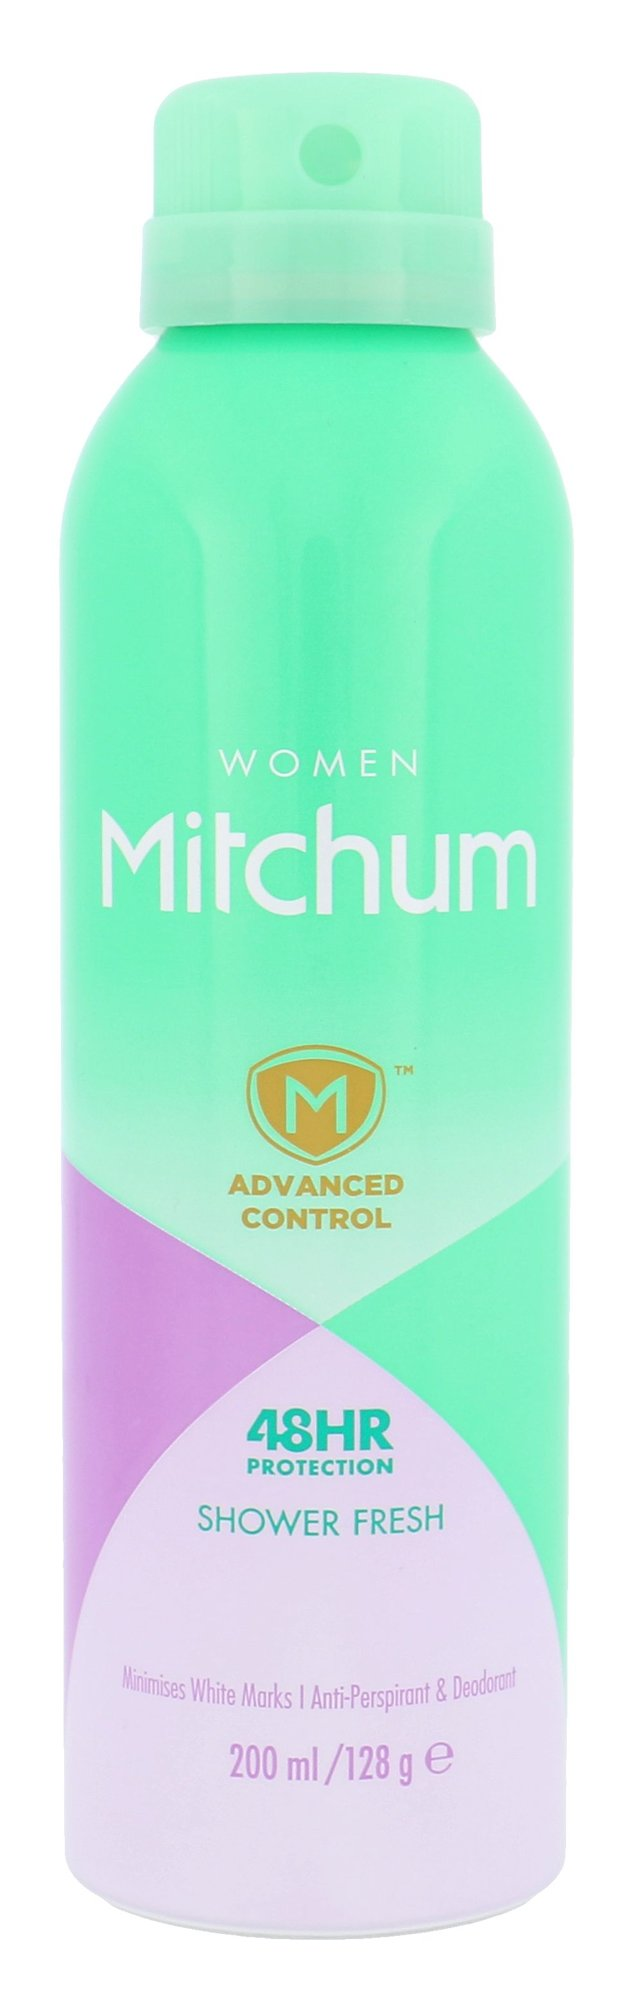 Mitchum Advanced Control Cosmetic 200ml  Shower Fresh